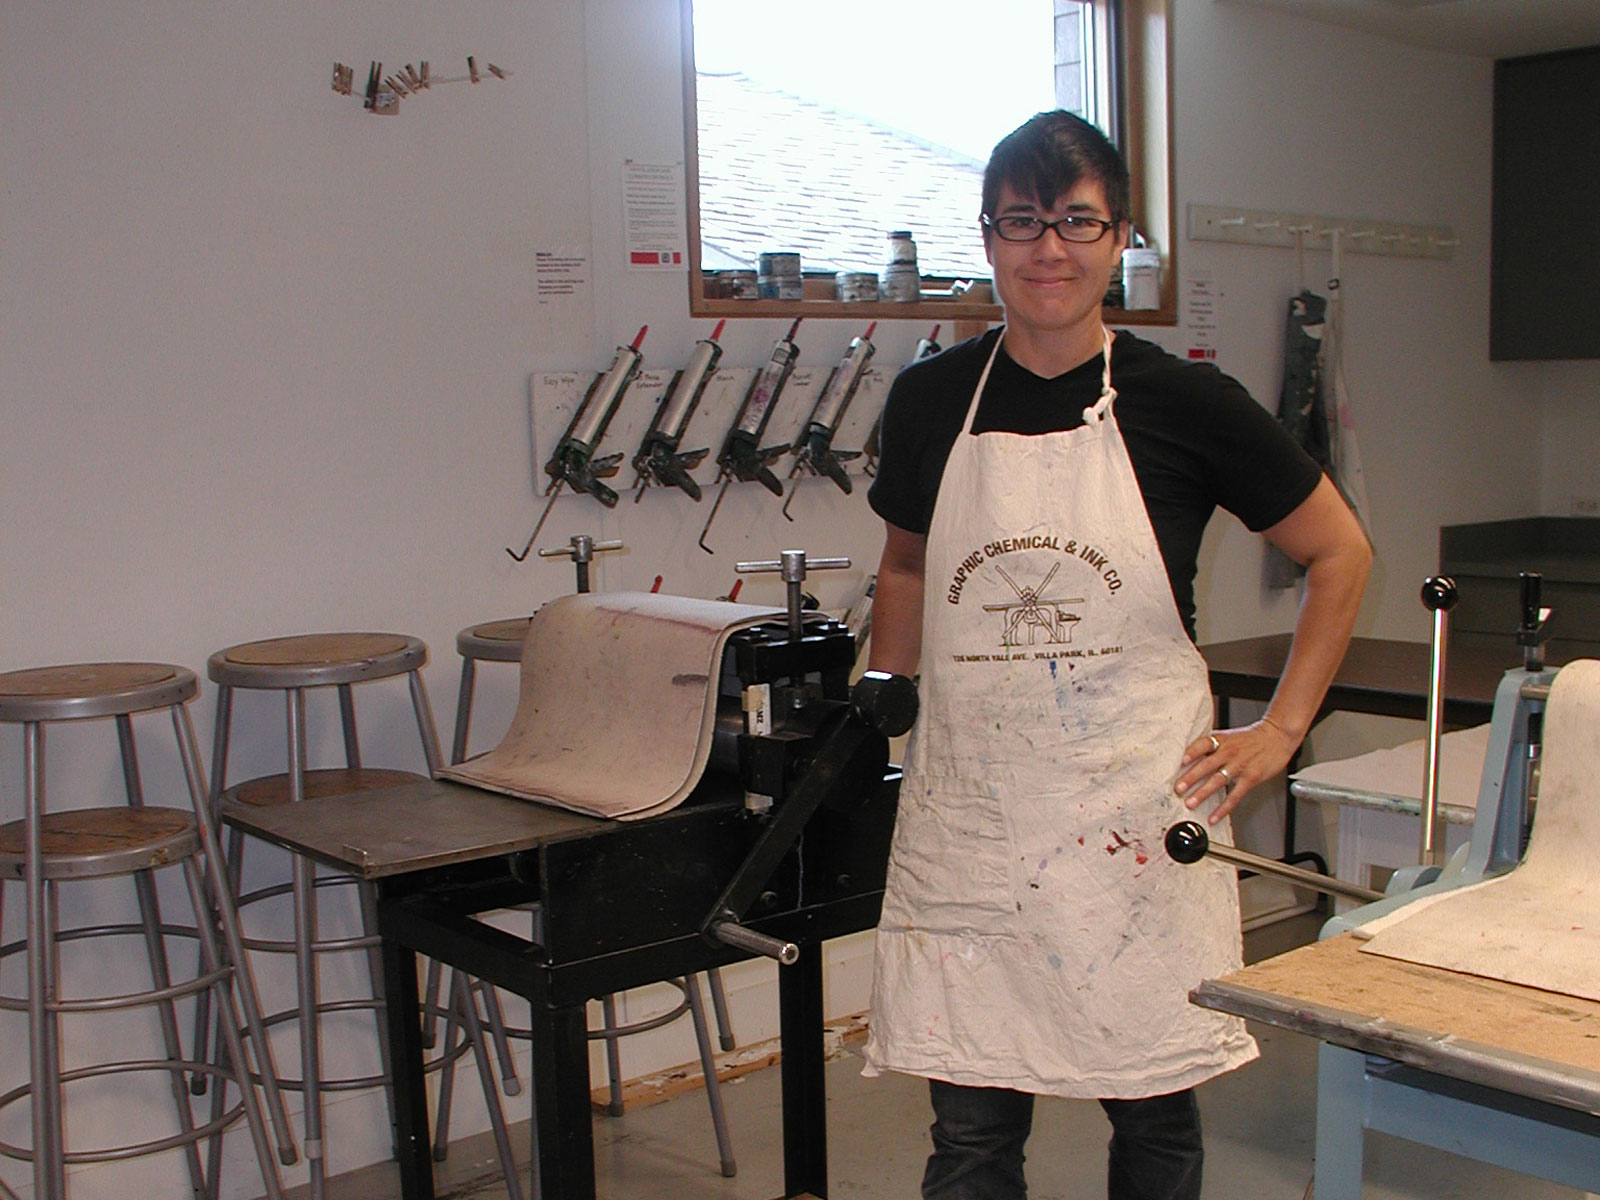 Intern Christa poses in the print studio